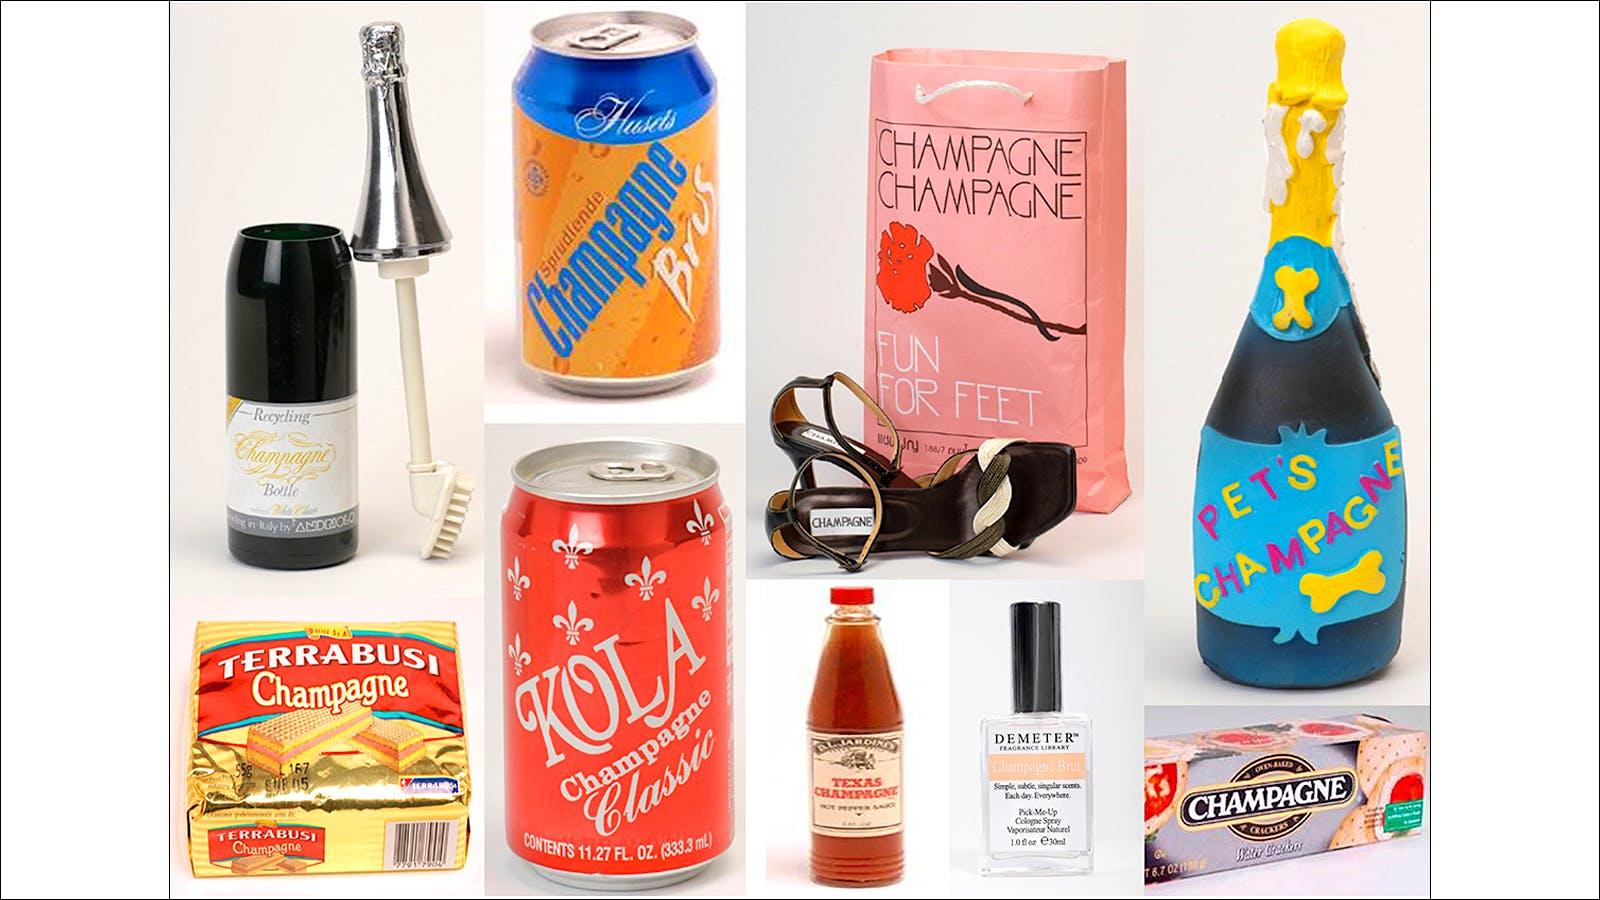 Champagne vs. Bread, Prosecco vs. 'Nosecco,' JaM vs. 'Jammy': Trademark Battles Erupt